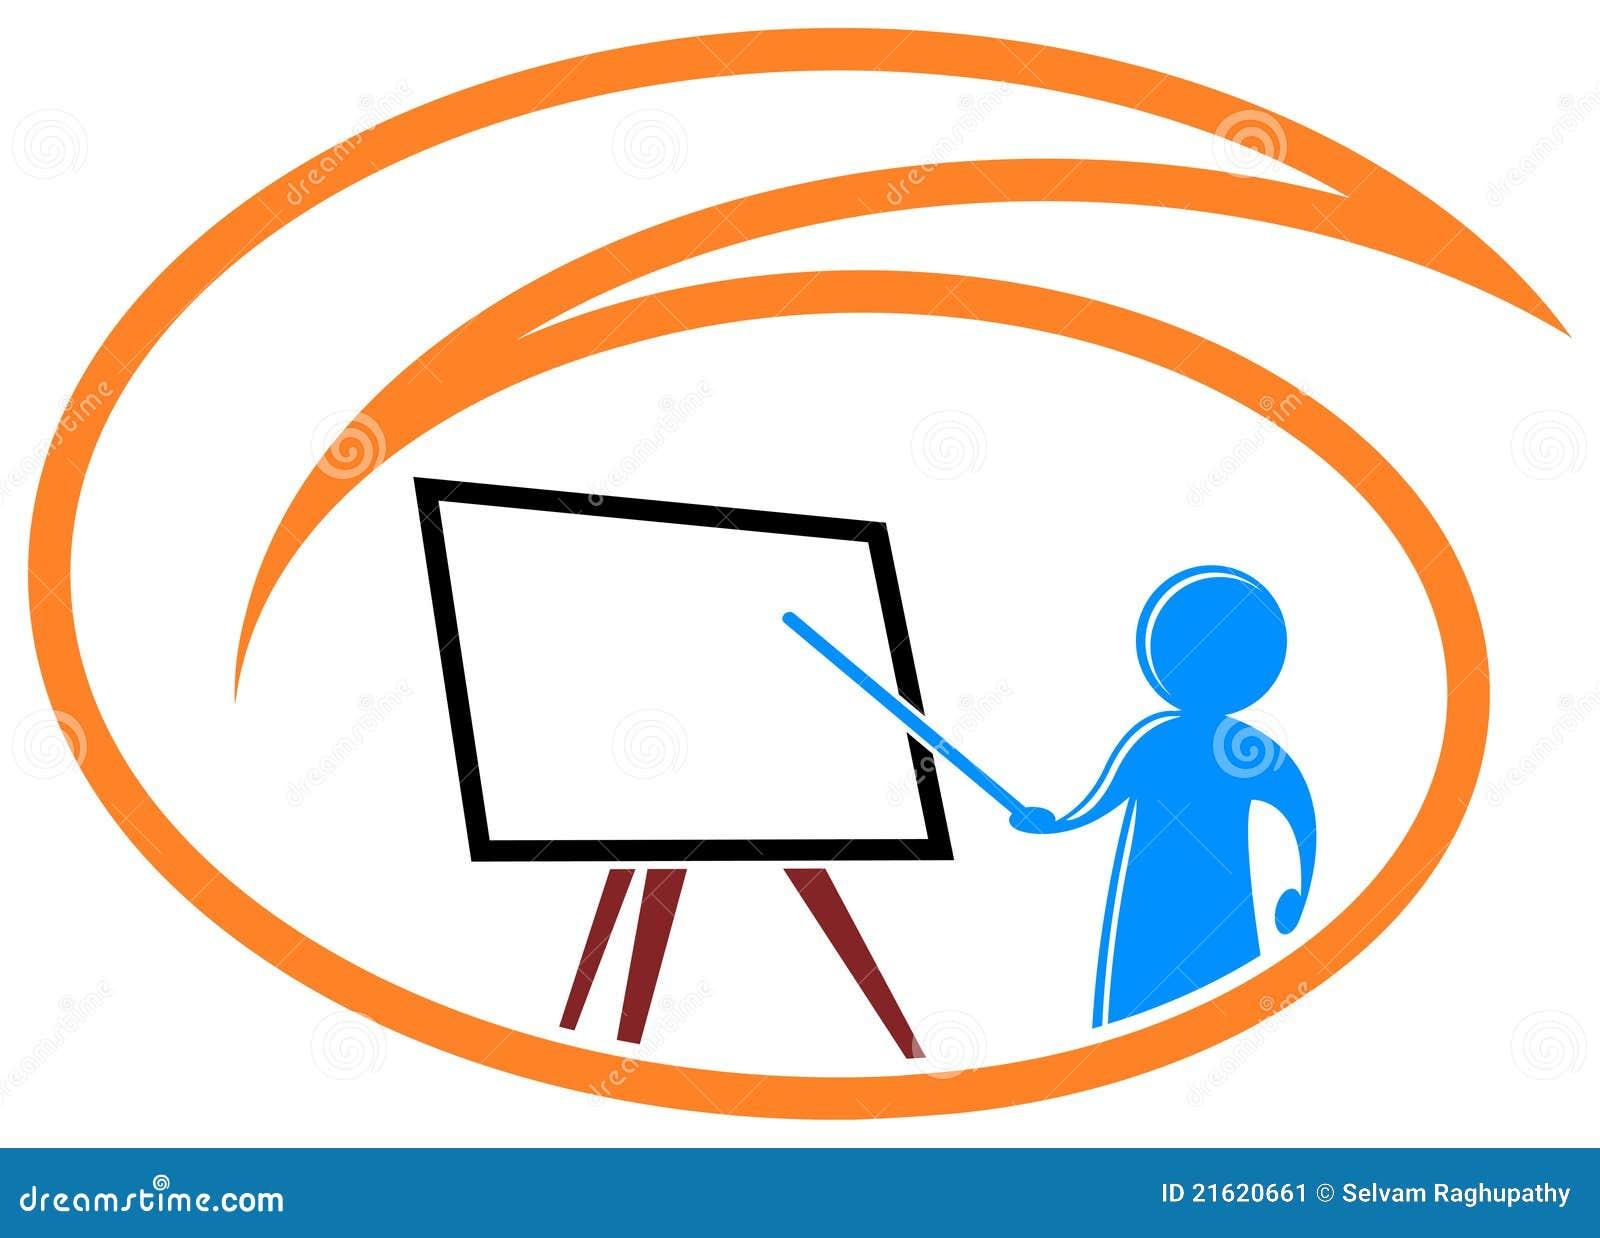 Classroom Logo Design : Teaching logo stock vector illustration of lecture